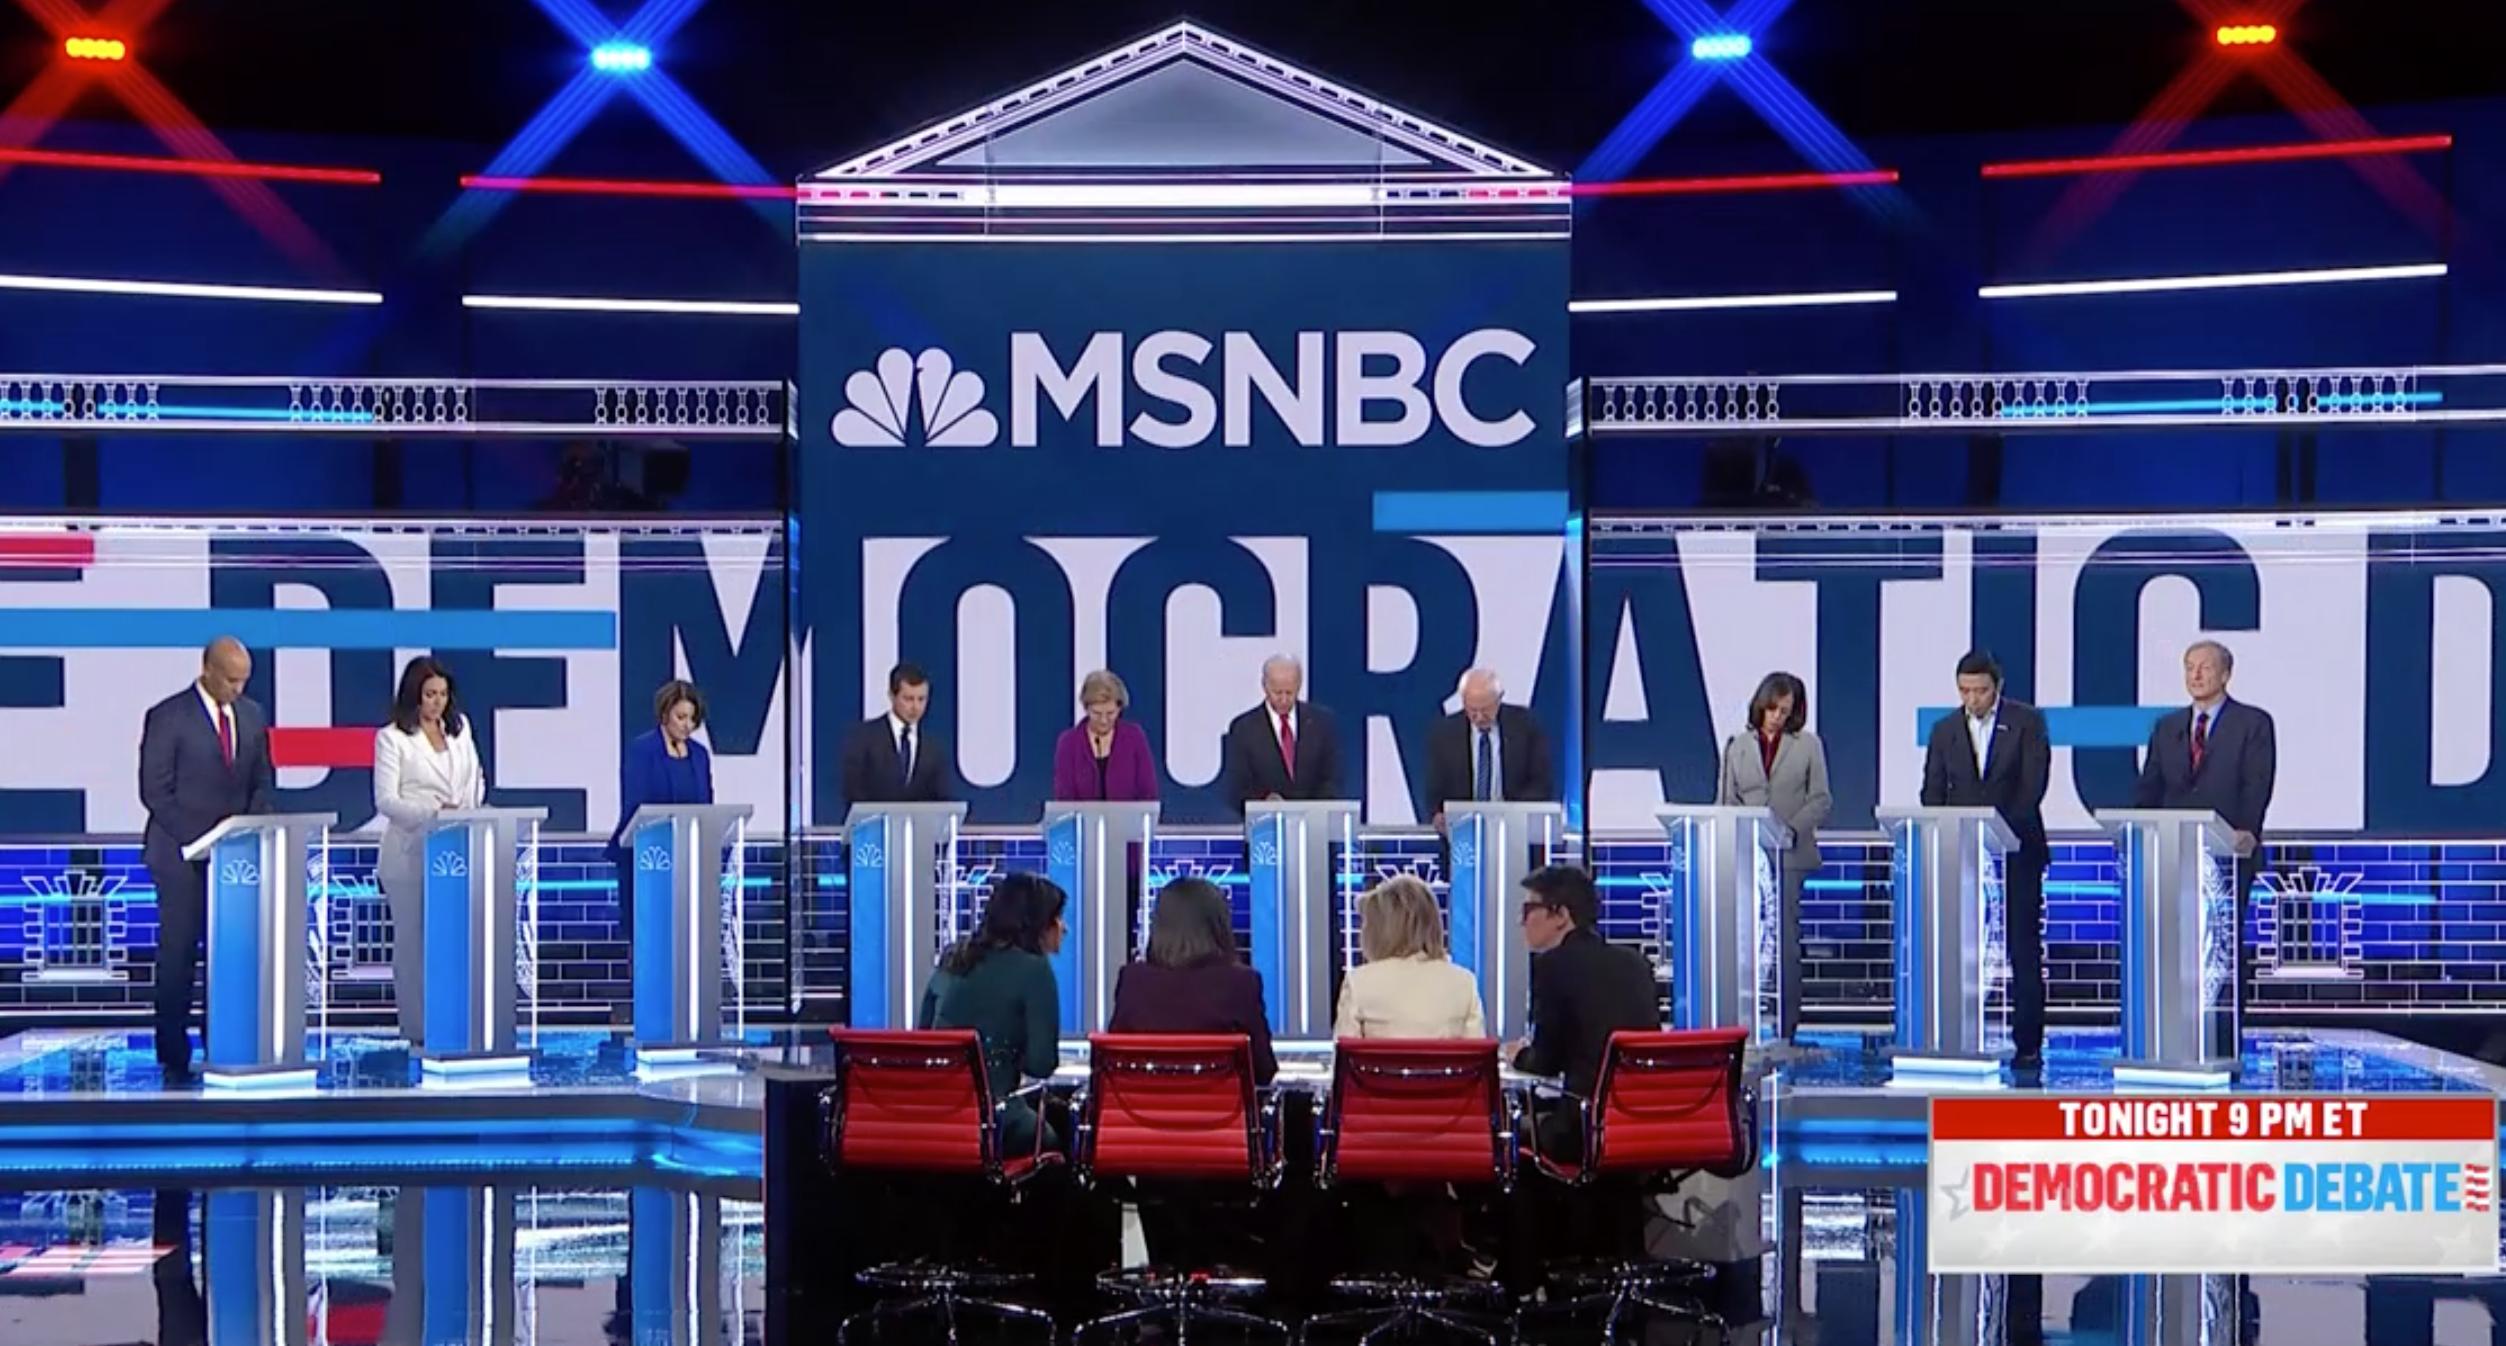 Live Updates On The Fifth Democratic debate